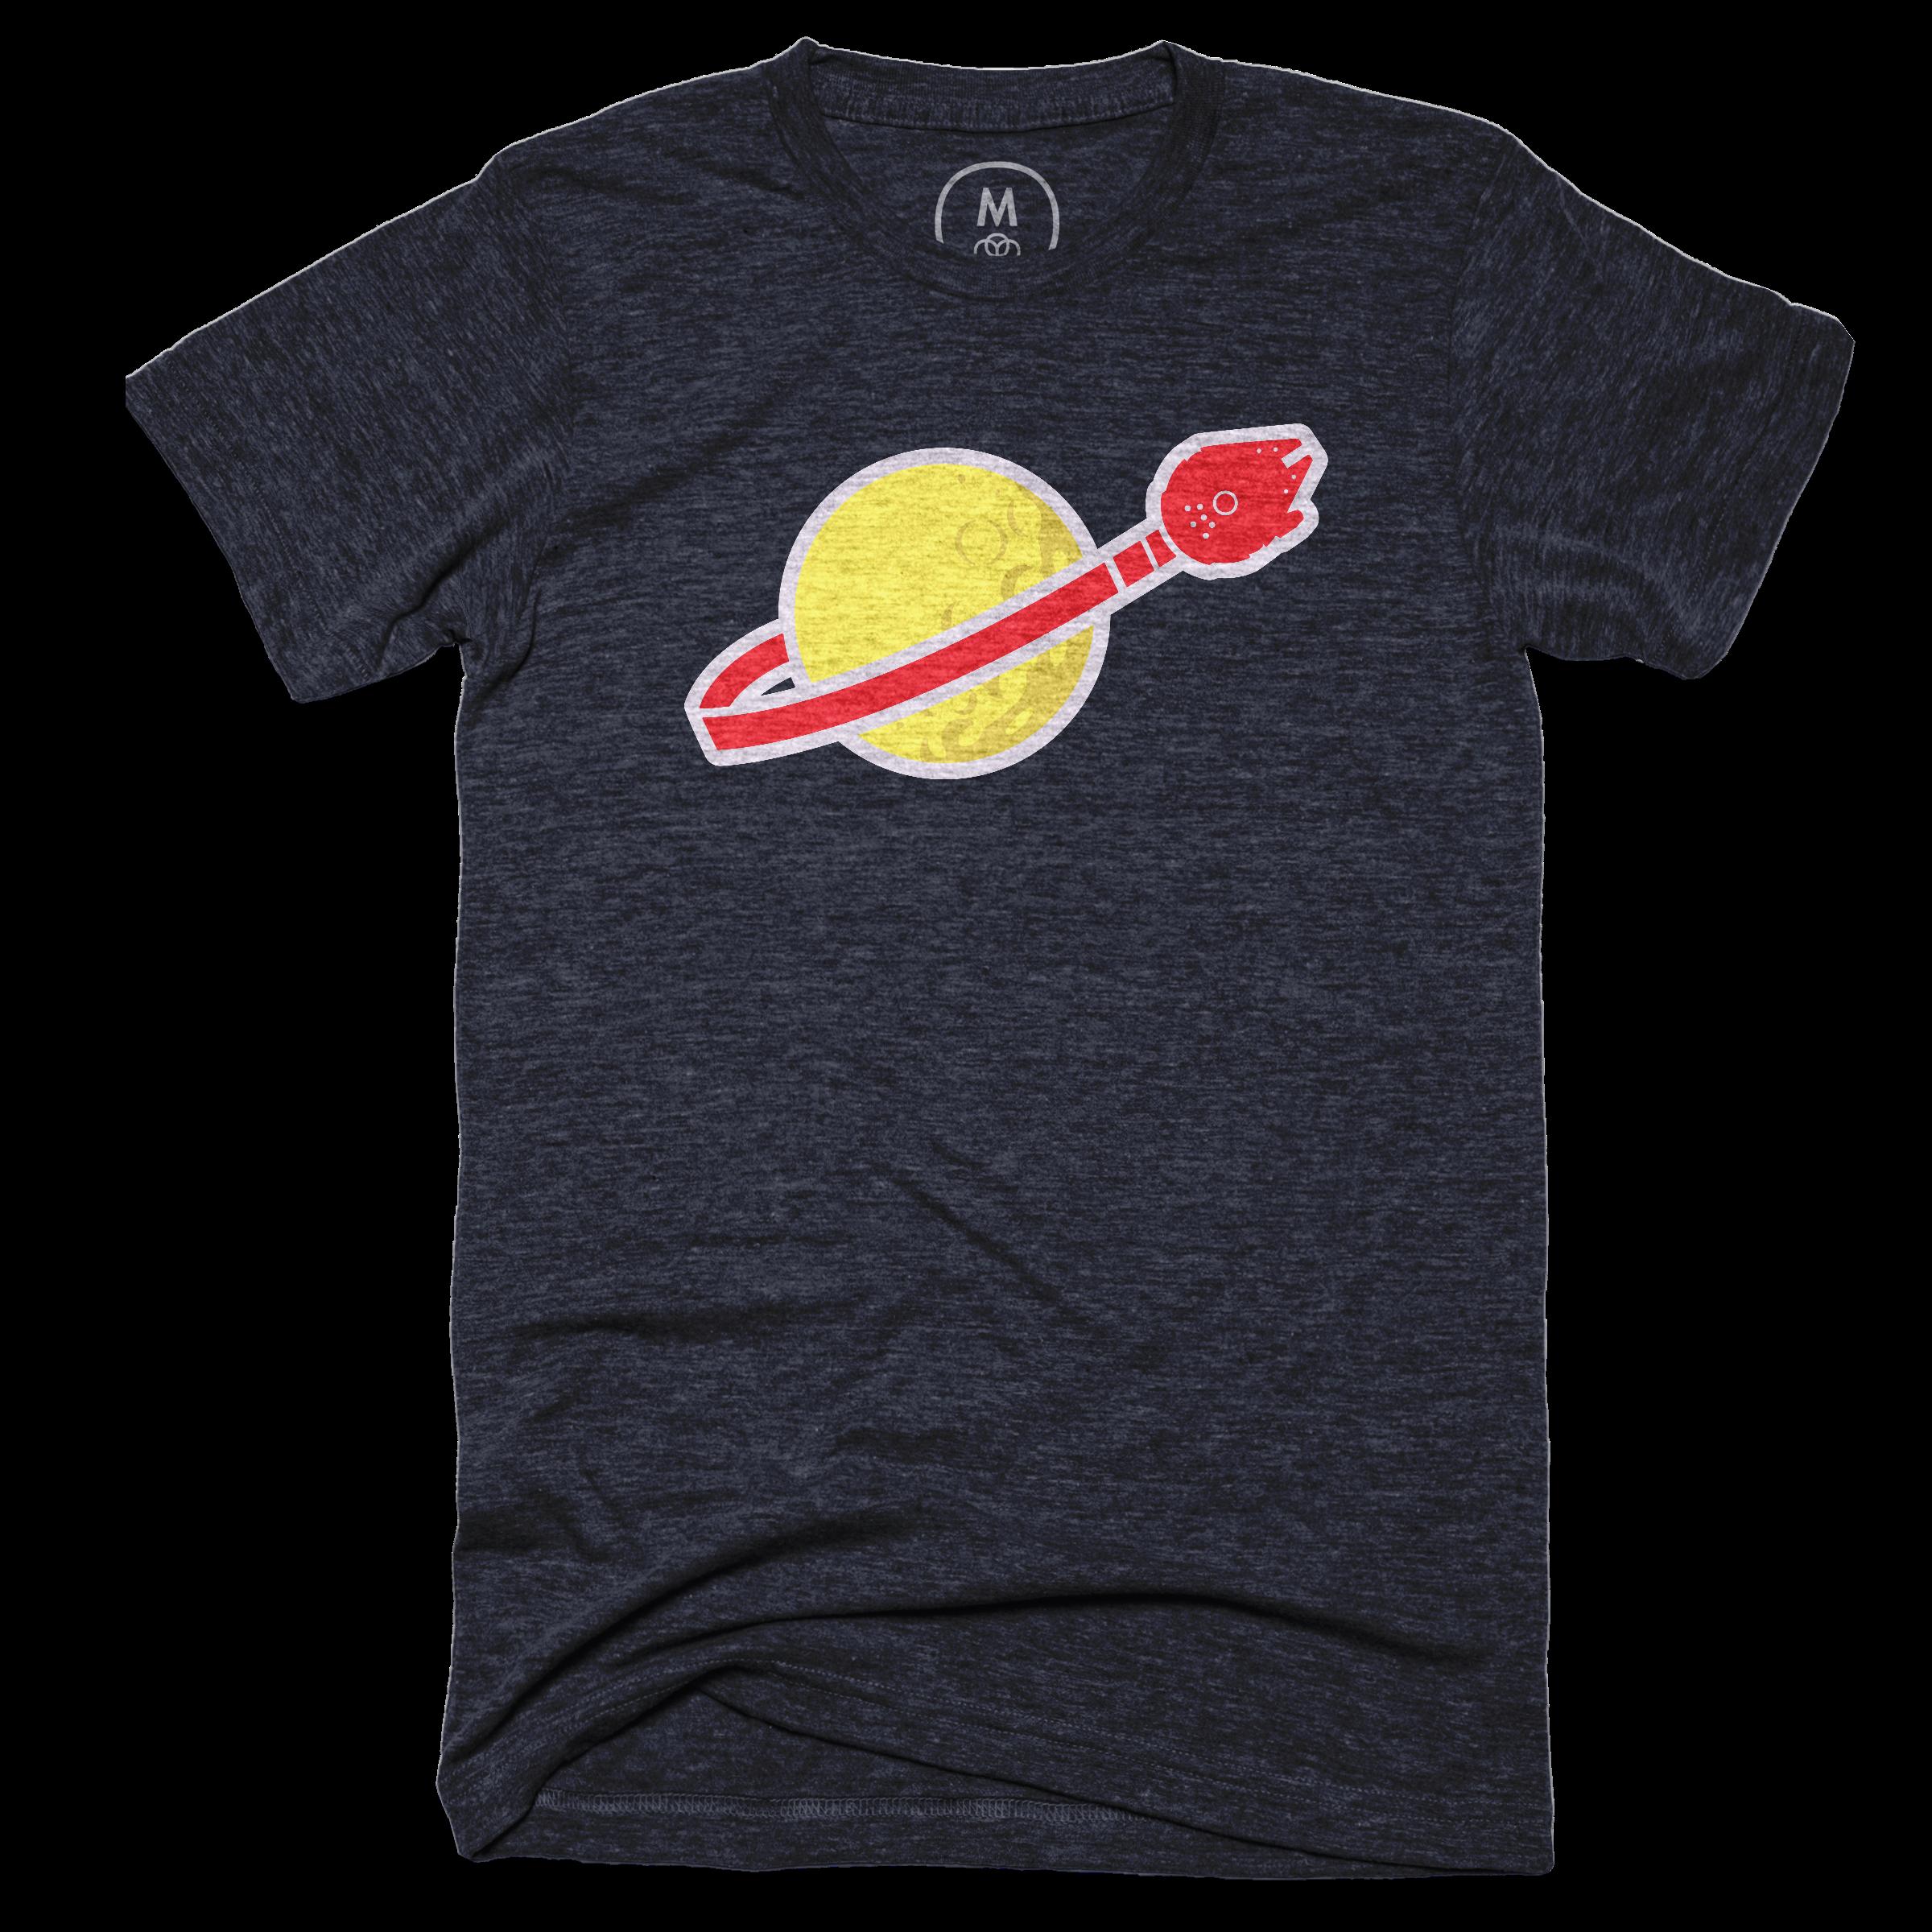 L.E.G.O. (League of Extraordinary Galactic Outlaws) Falcon Style